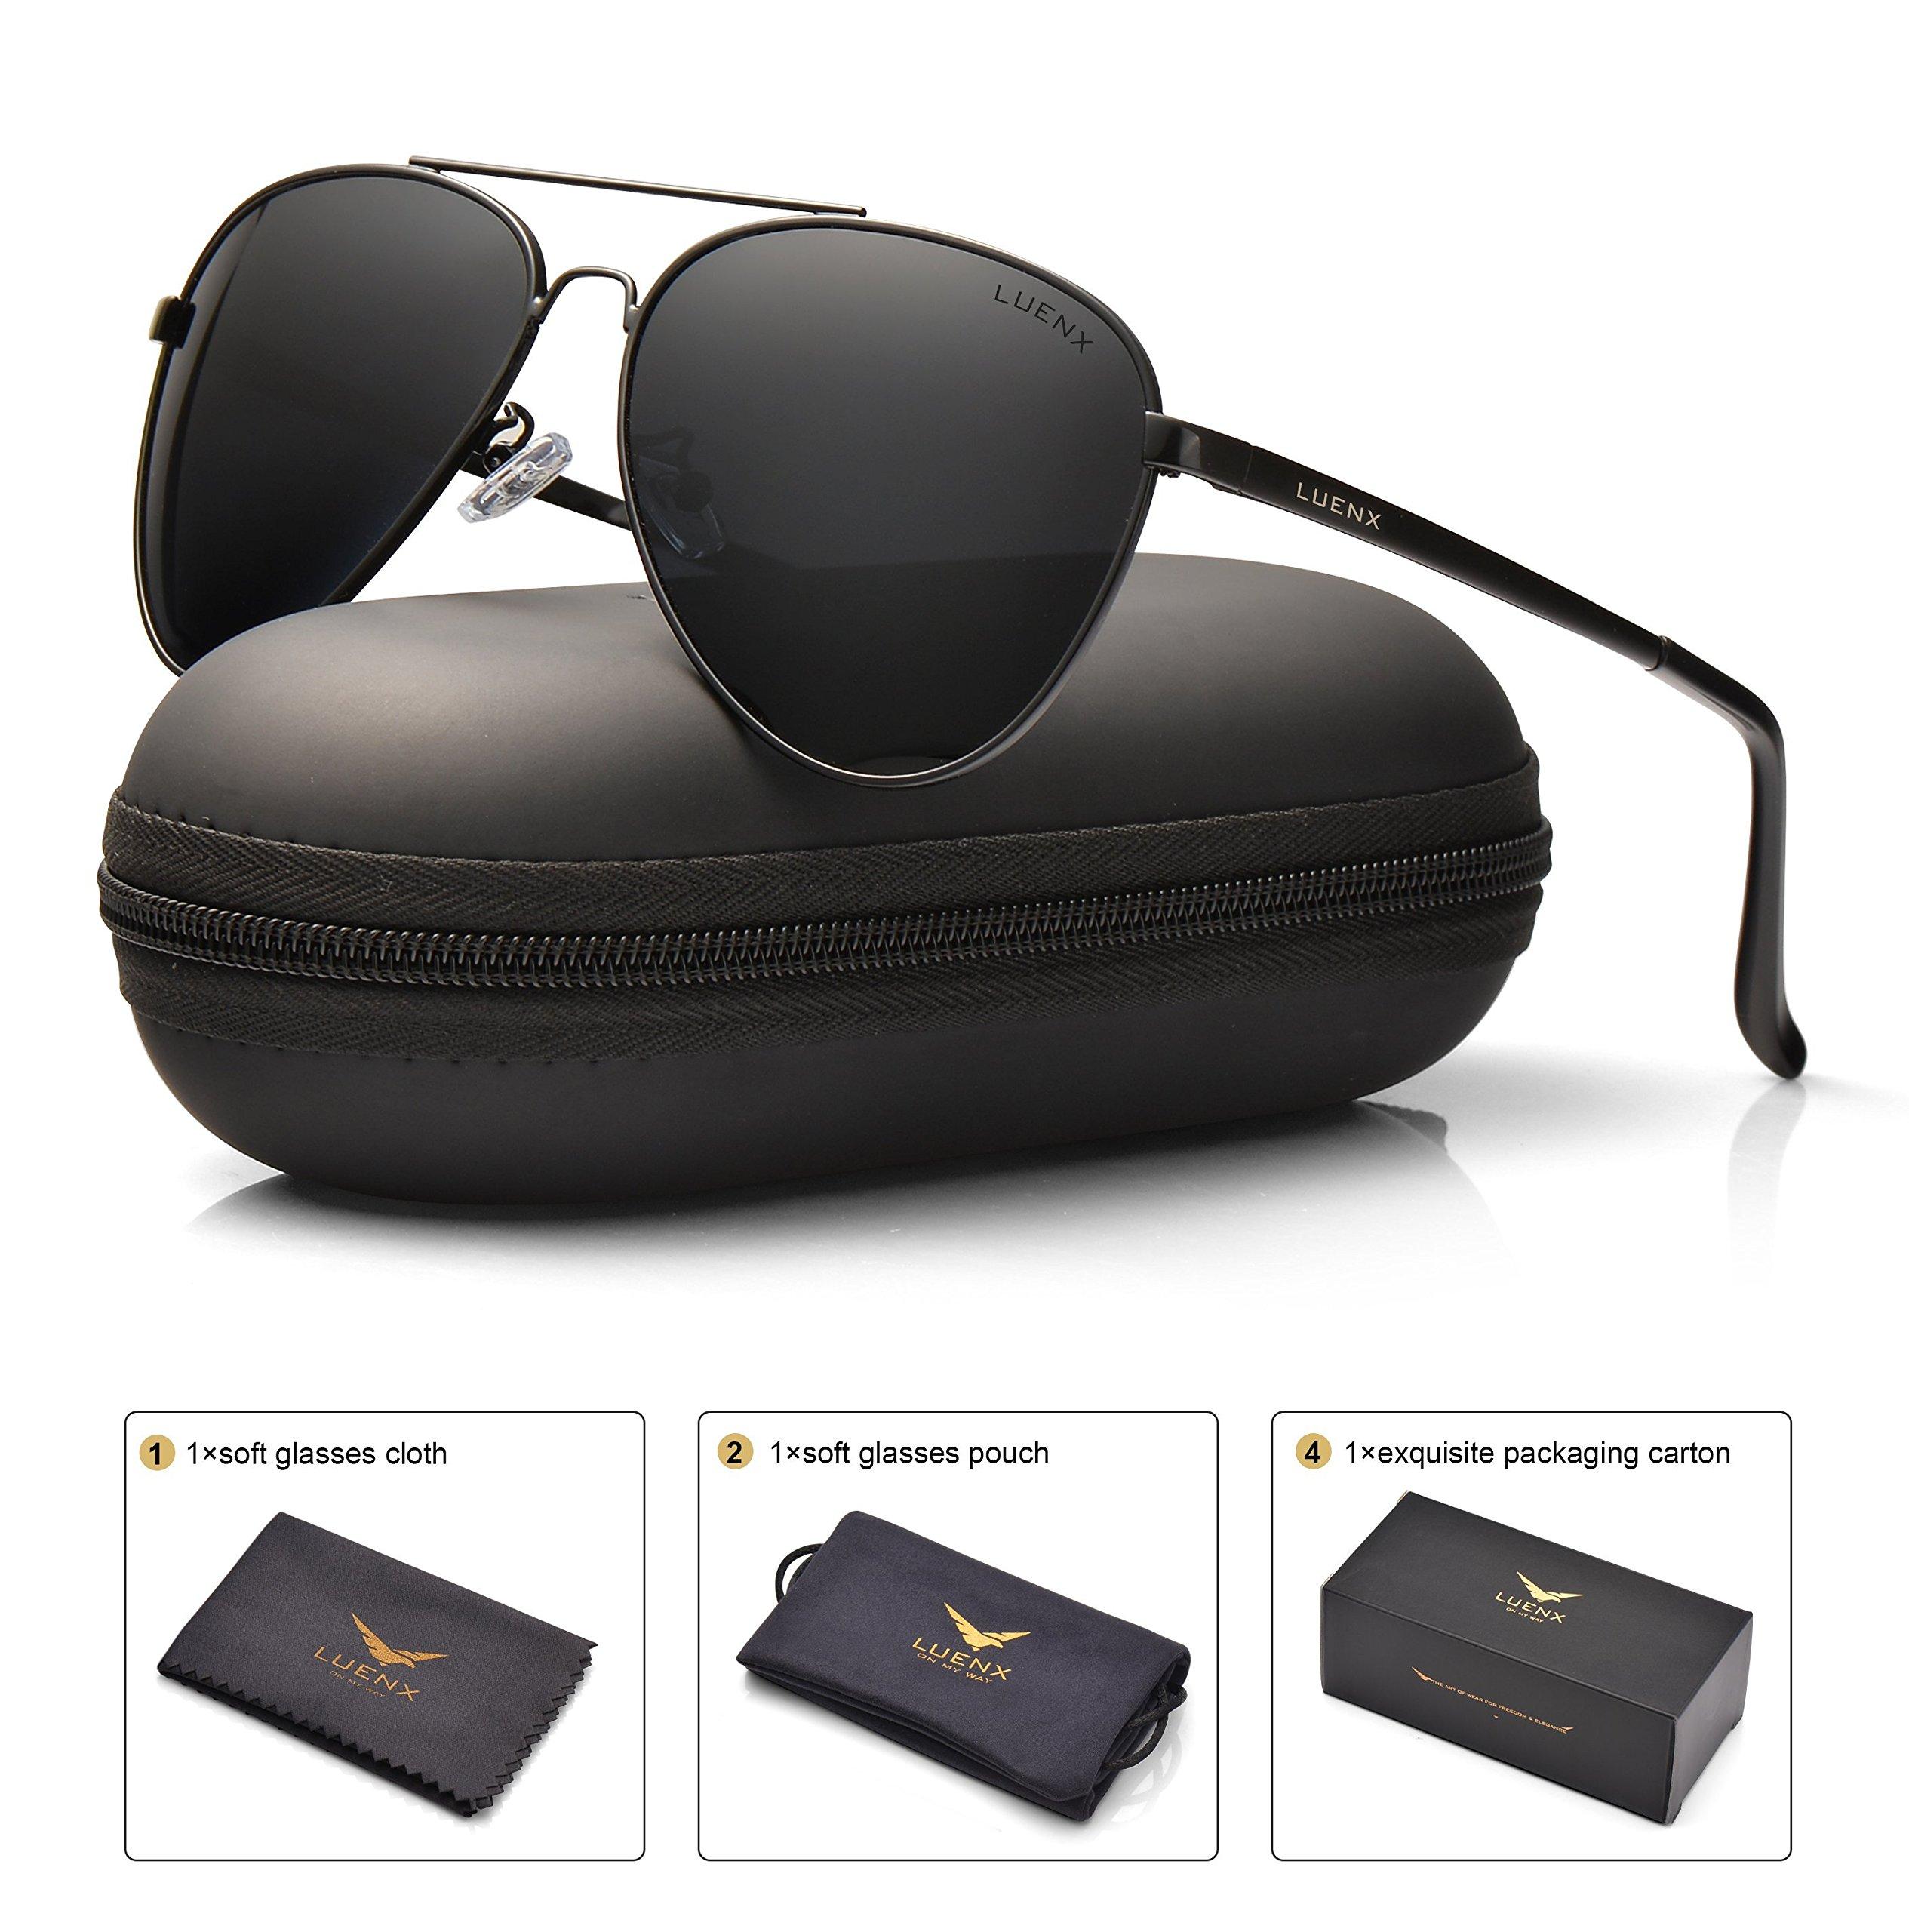 LUENX Men Women Aviator Sunglasses Polarized Non-Mirror Black Lens Black Metal Frame with Accessories UV 400 Protection 60MM